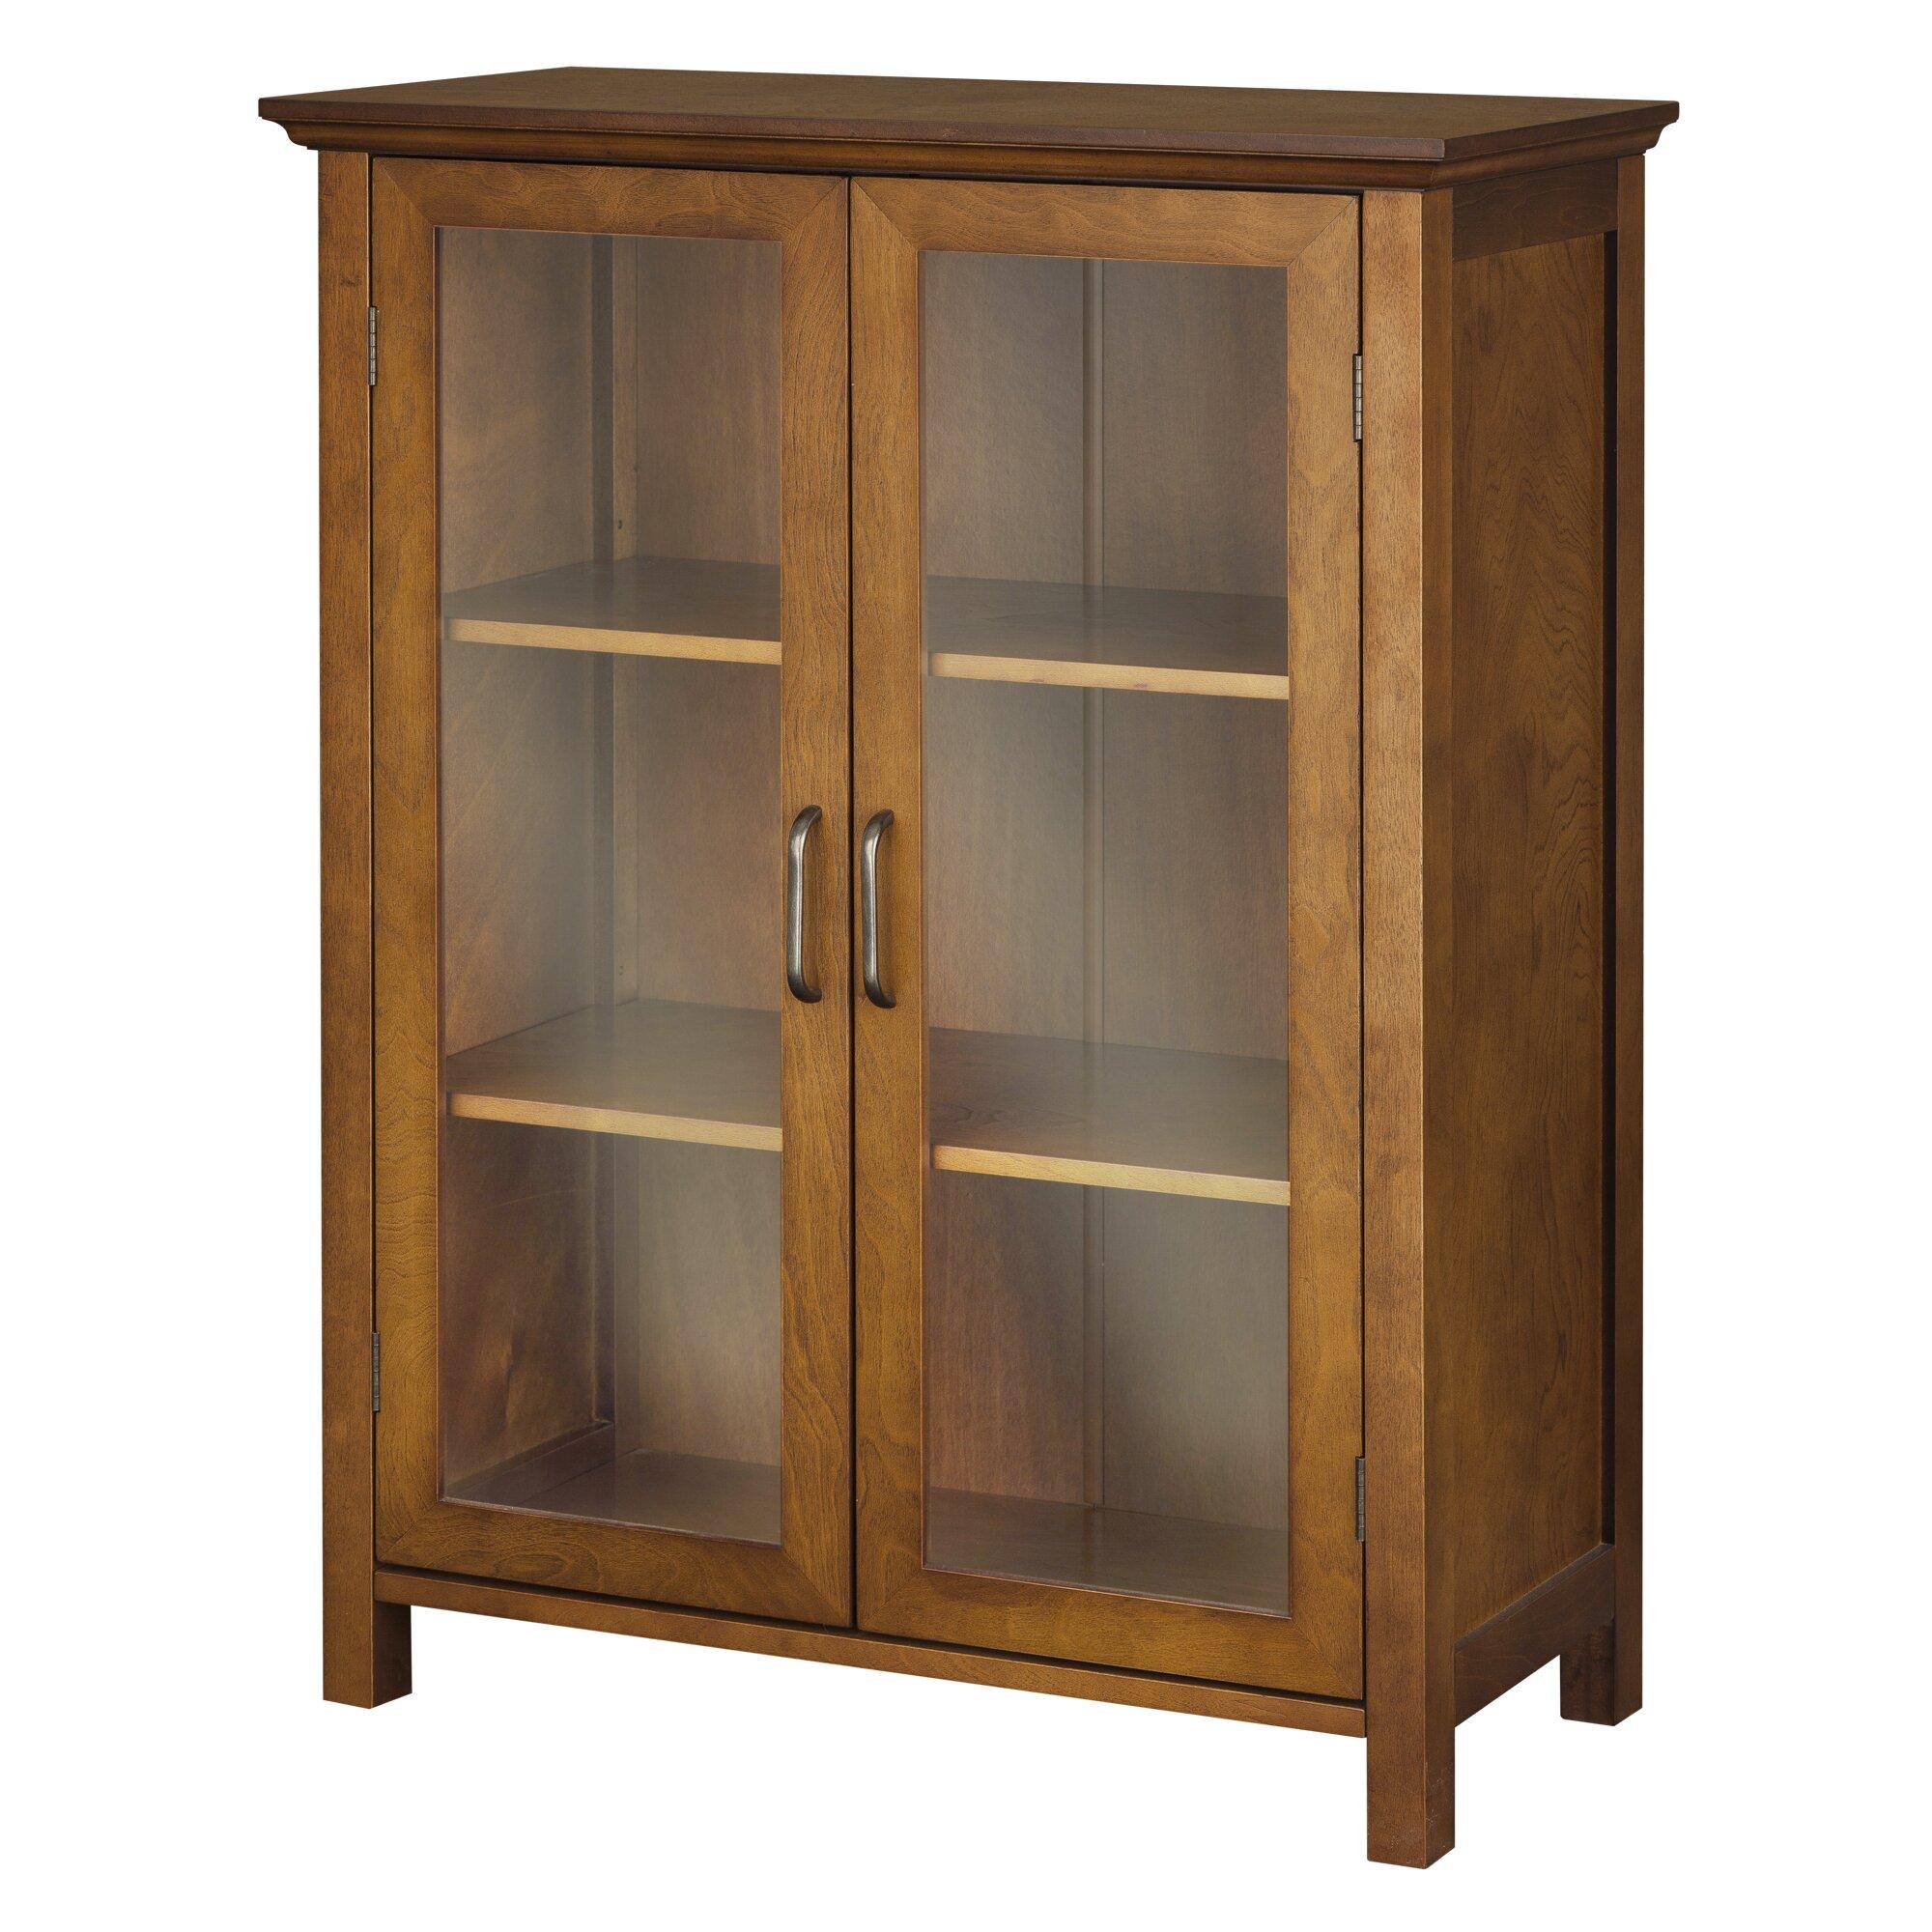 elegant home fashions avery 26 w x 34 h cabinet. Black Bedroom Furniture Sets. Home Design Ideas